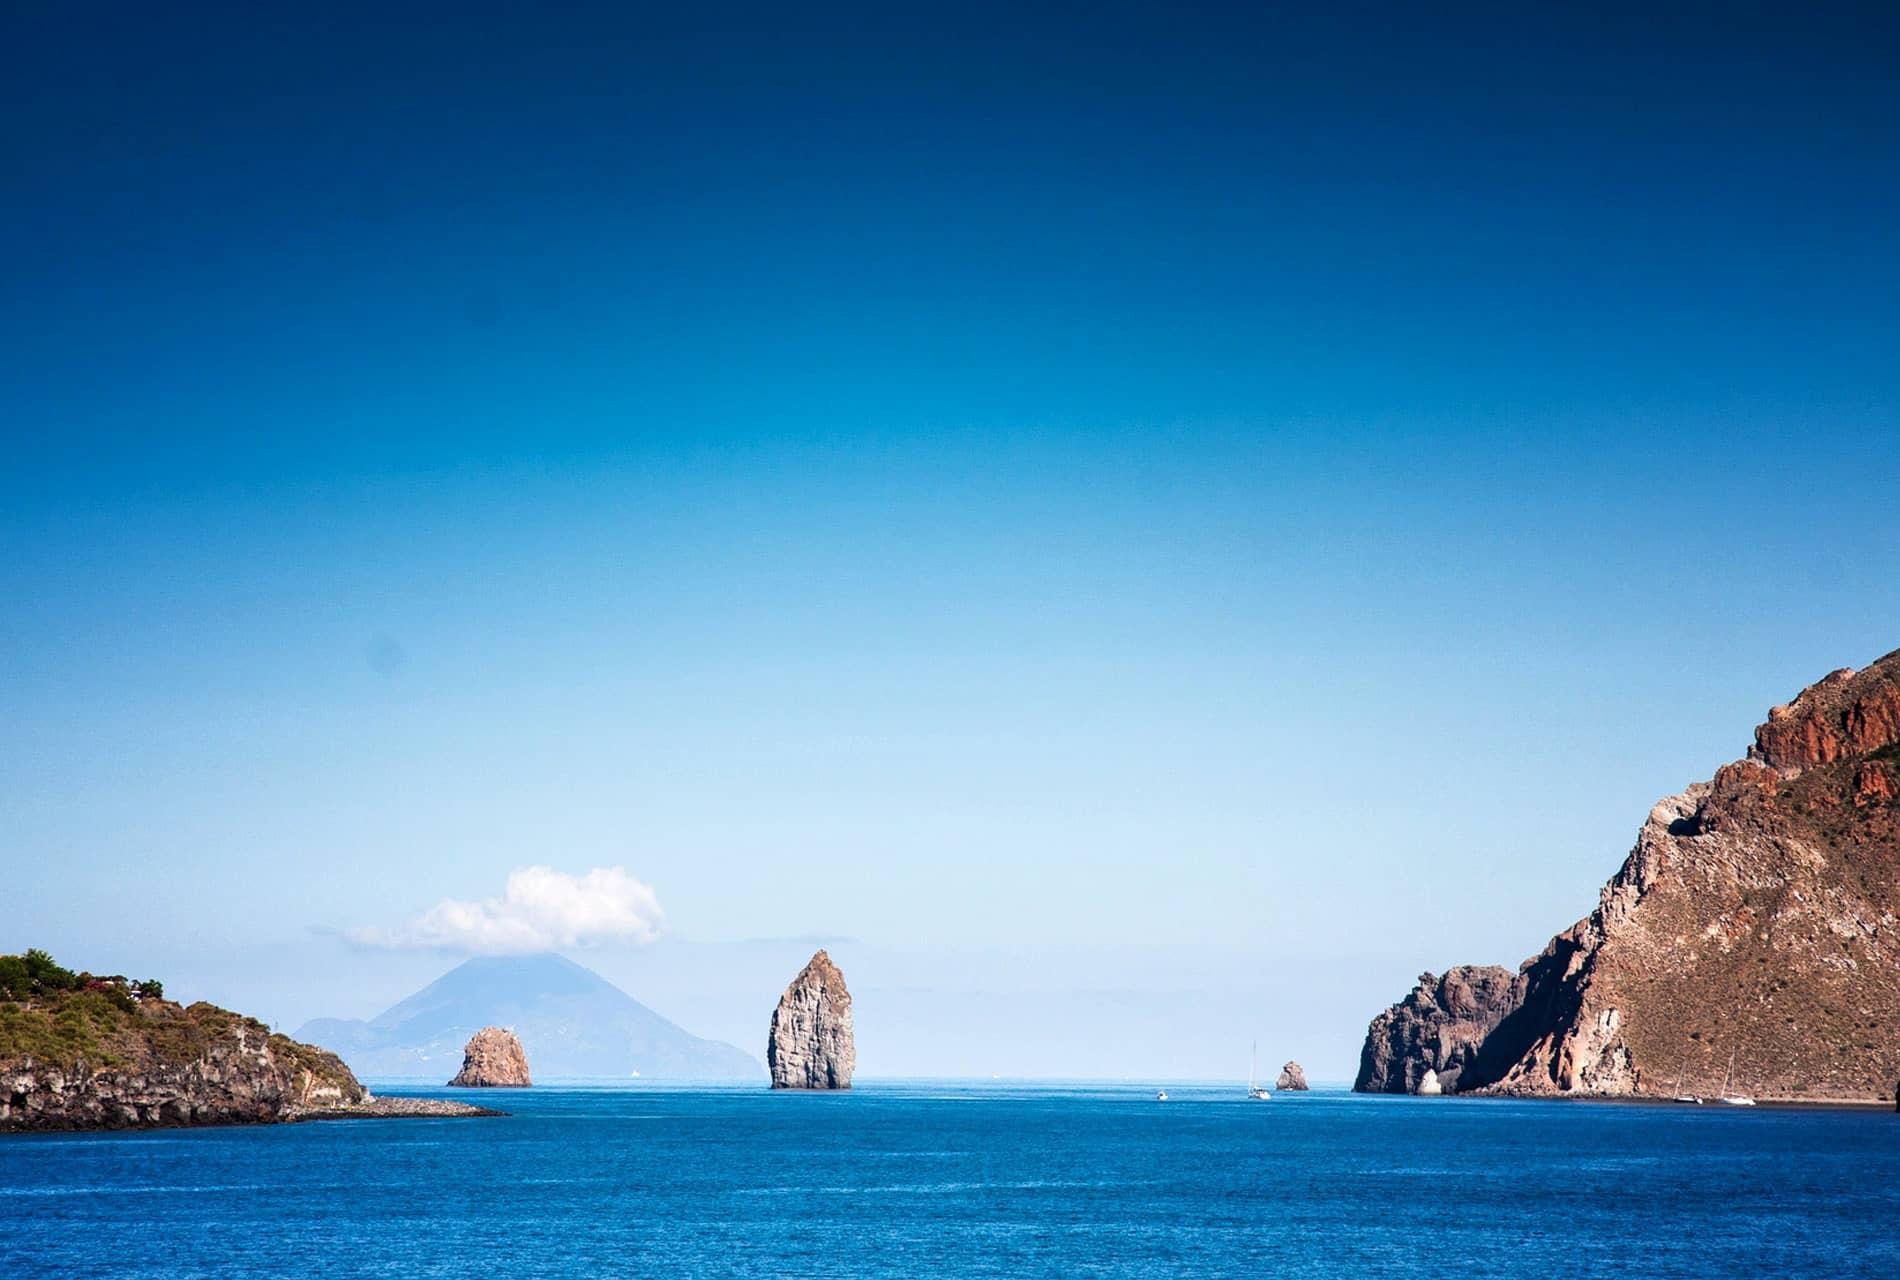 Sicilia, Isole Eolie